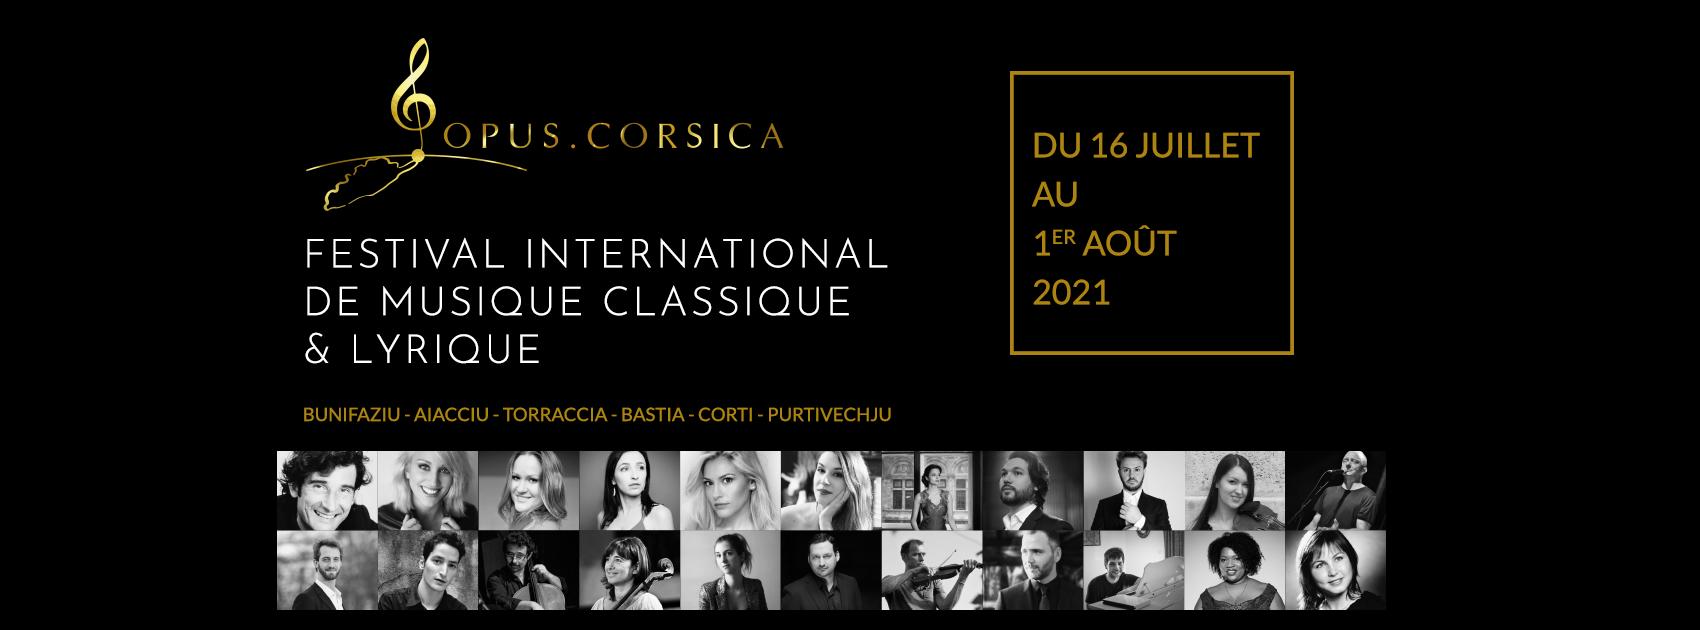 "Festival ""Opus Corsica Estate 2021"" du 16 au 1er Août"